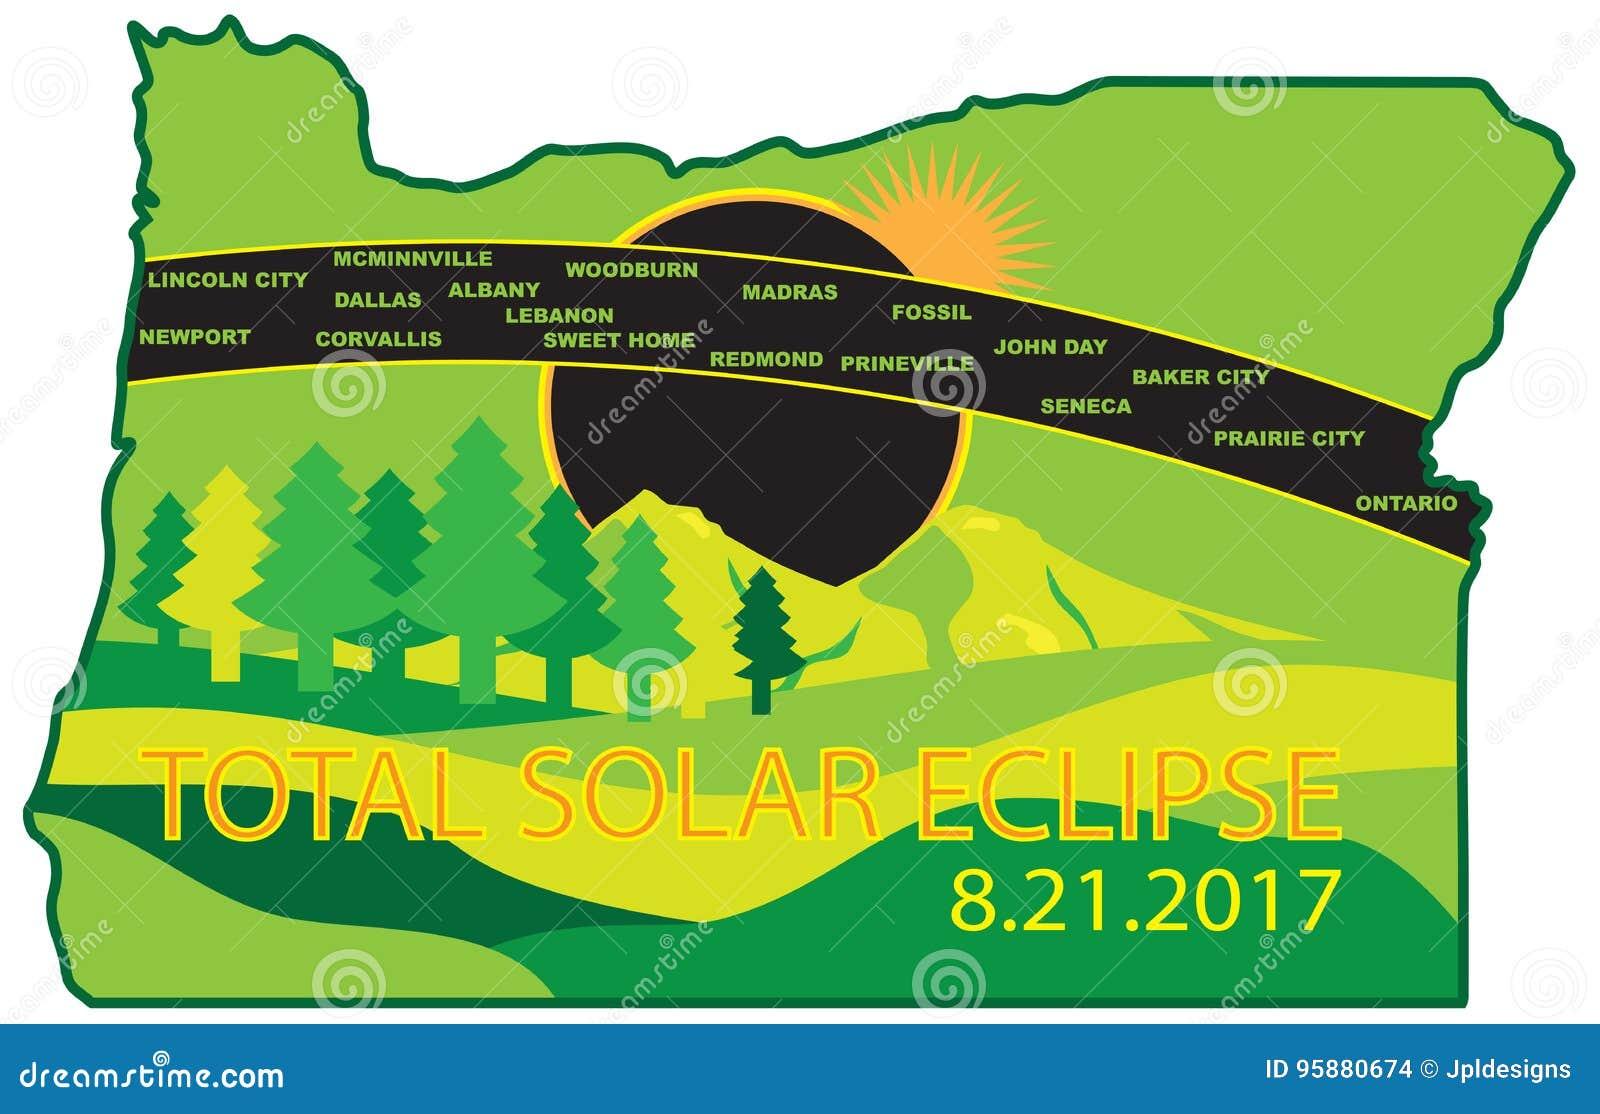 2017 Total Solar Eclipse Across Oregon Cities Map Vector